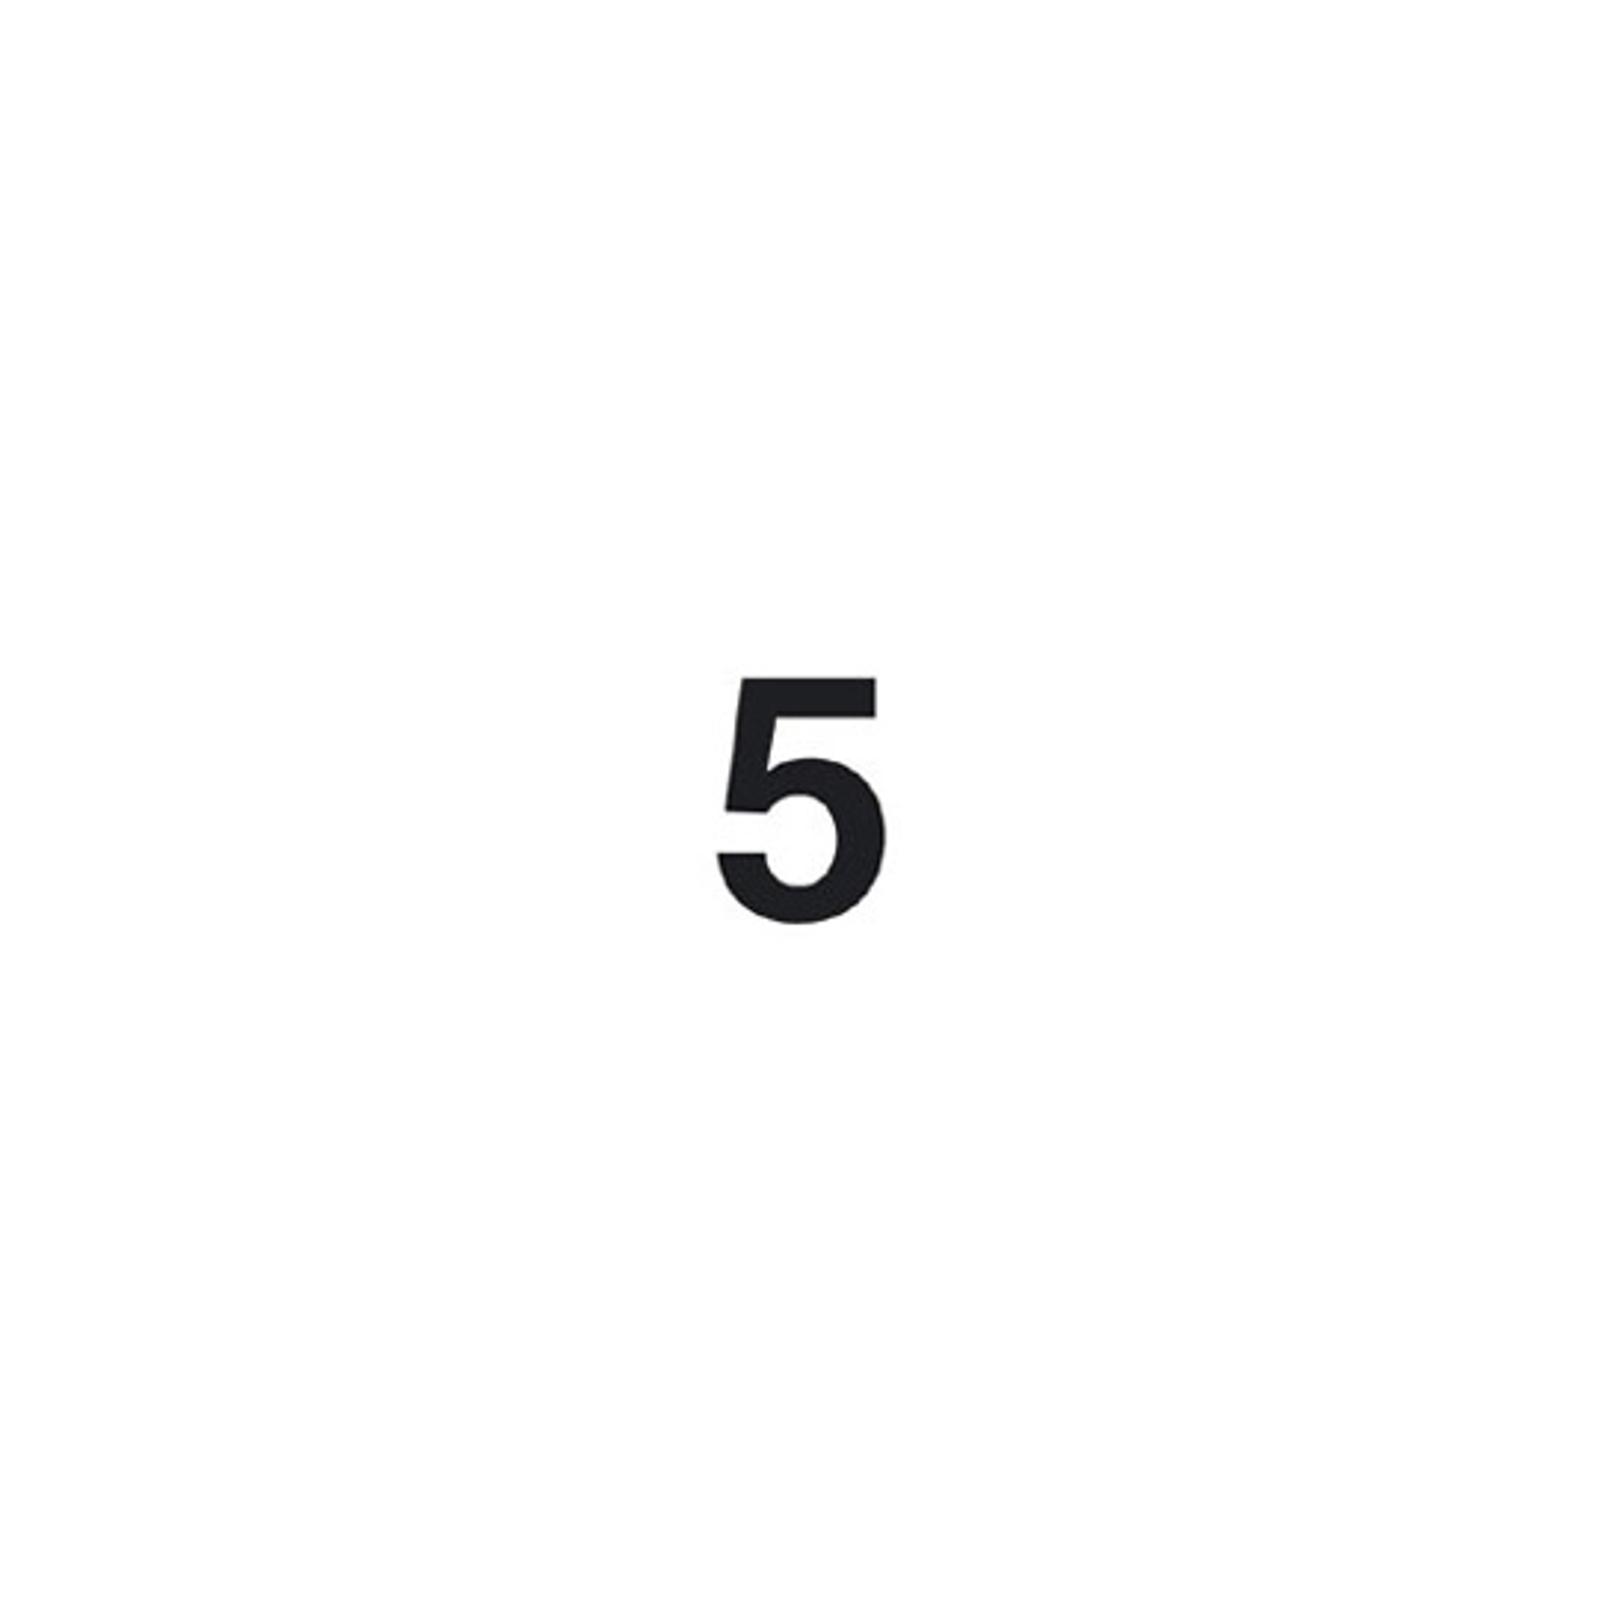 Selbstklebende Ziffer 5